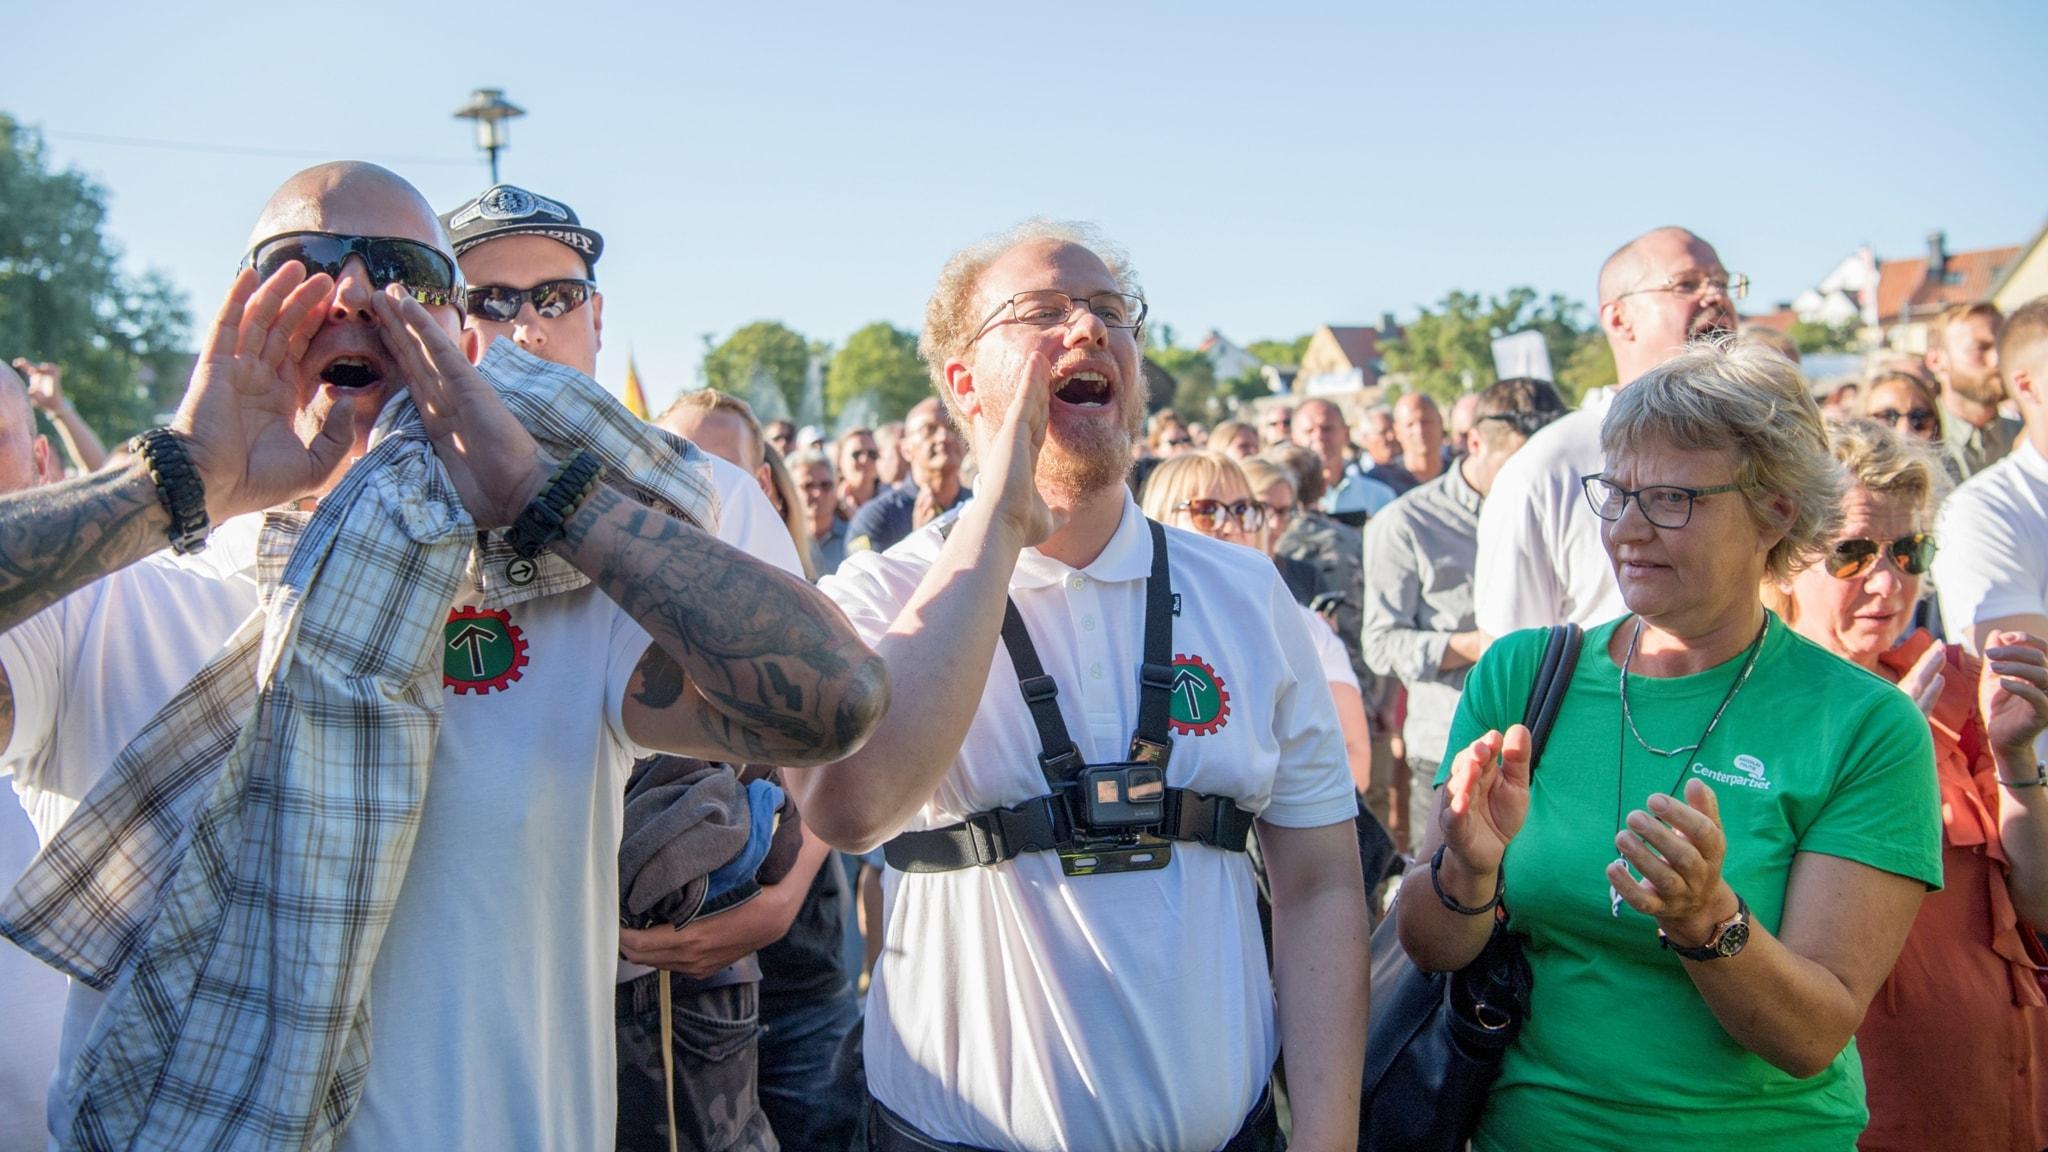 Kris omringade nazister under Almedalsveckan - P4 Halland